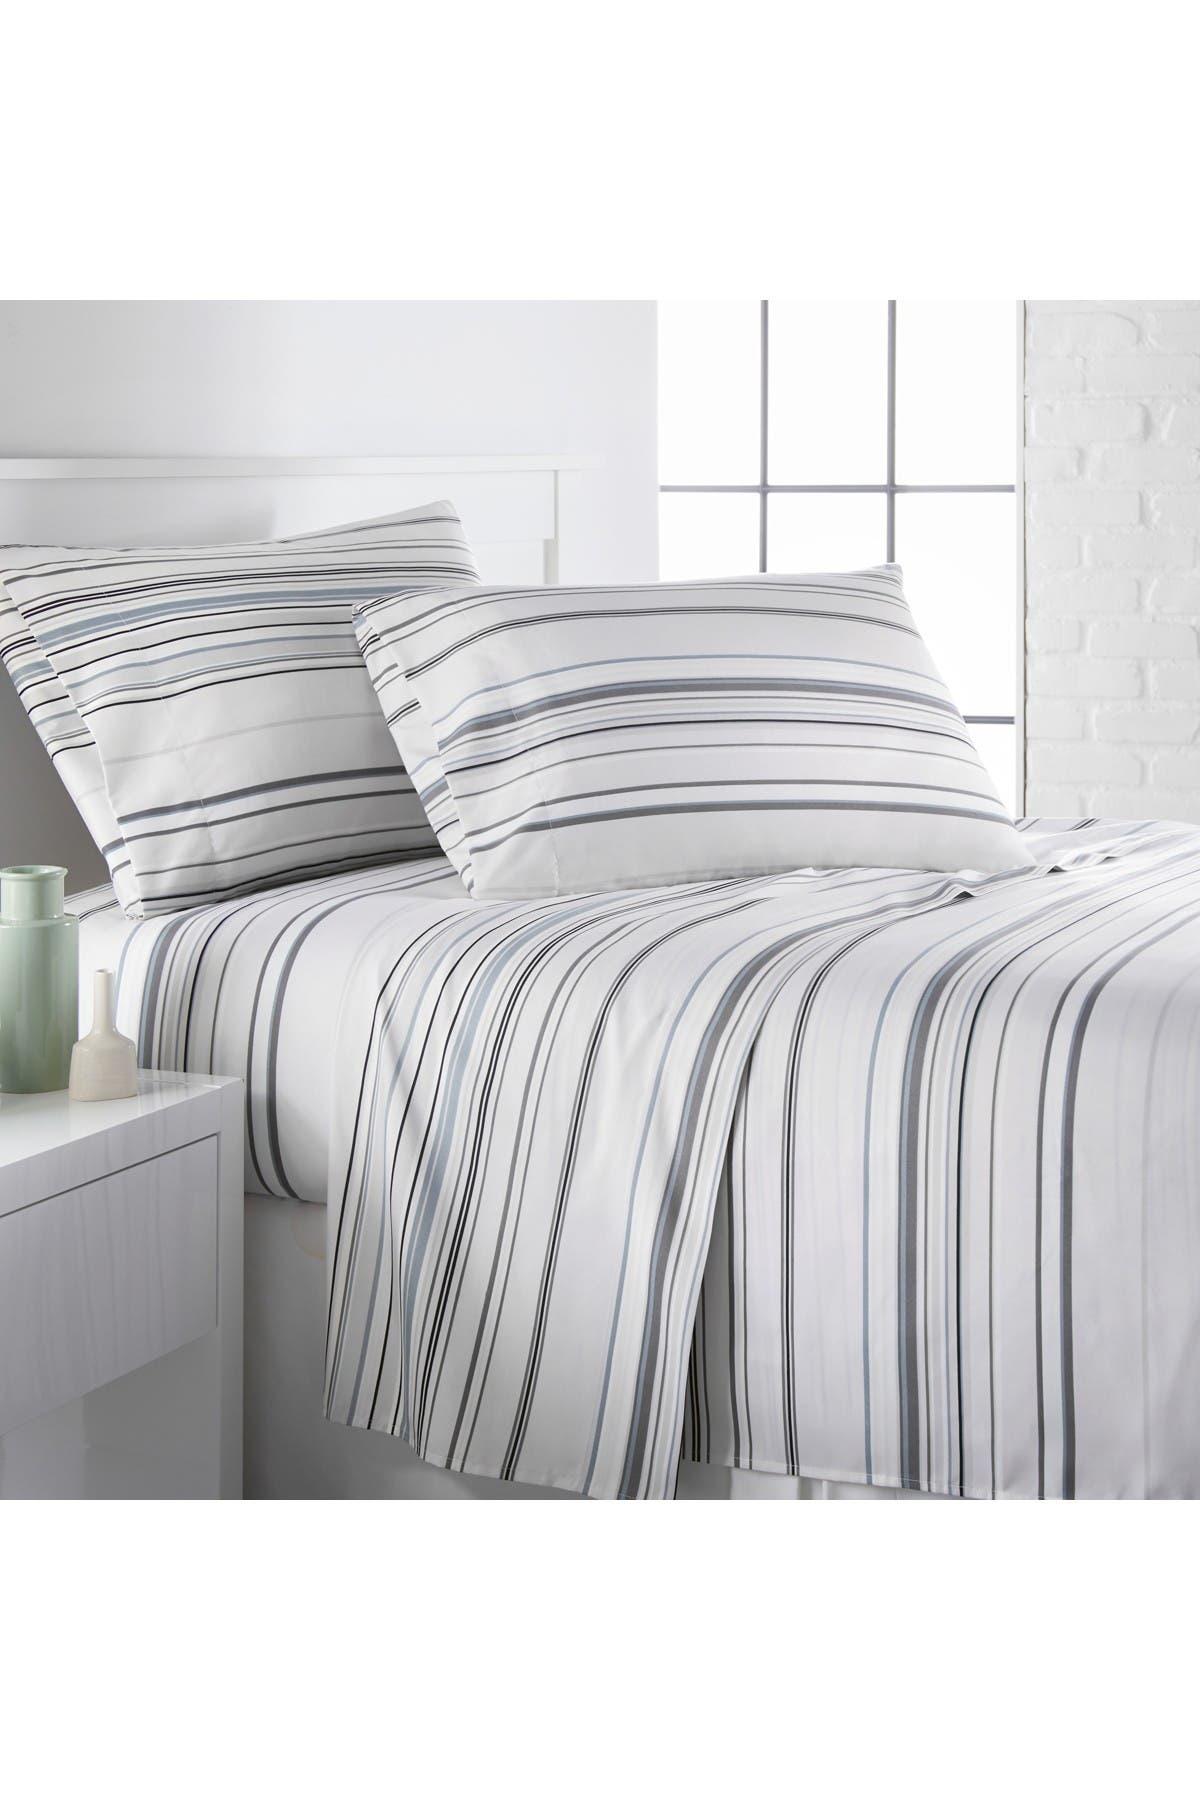 Image of SOUTHSHORE FINE LINENS King Premium Collection Printed Deep Pocket Sheet Sets - Gray